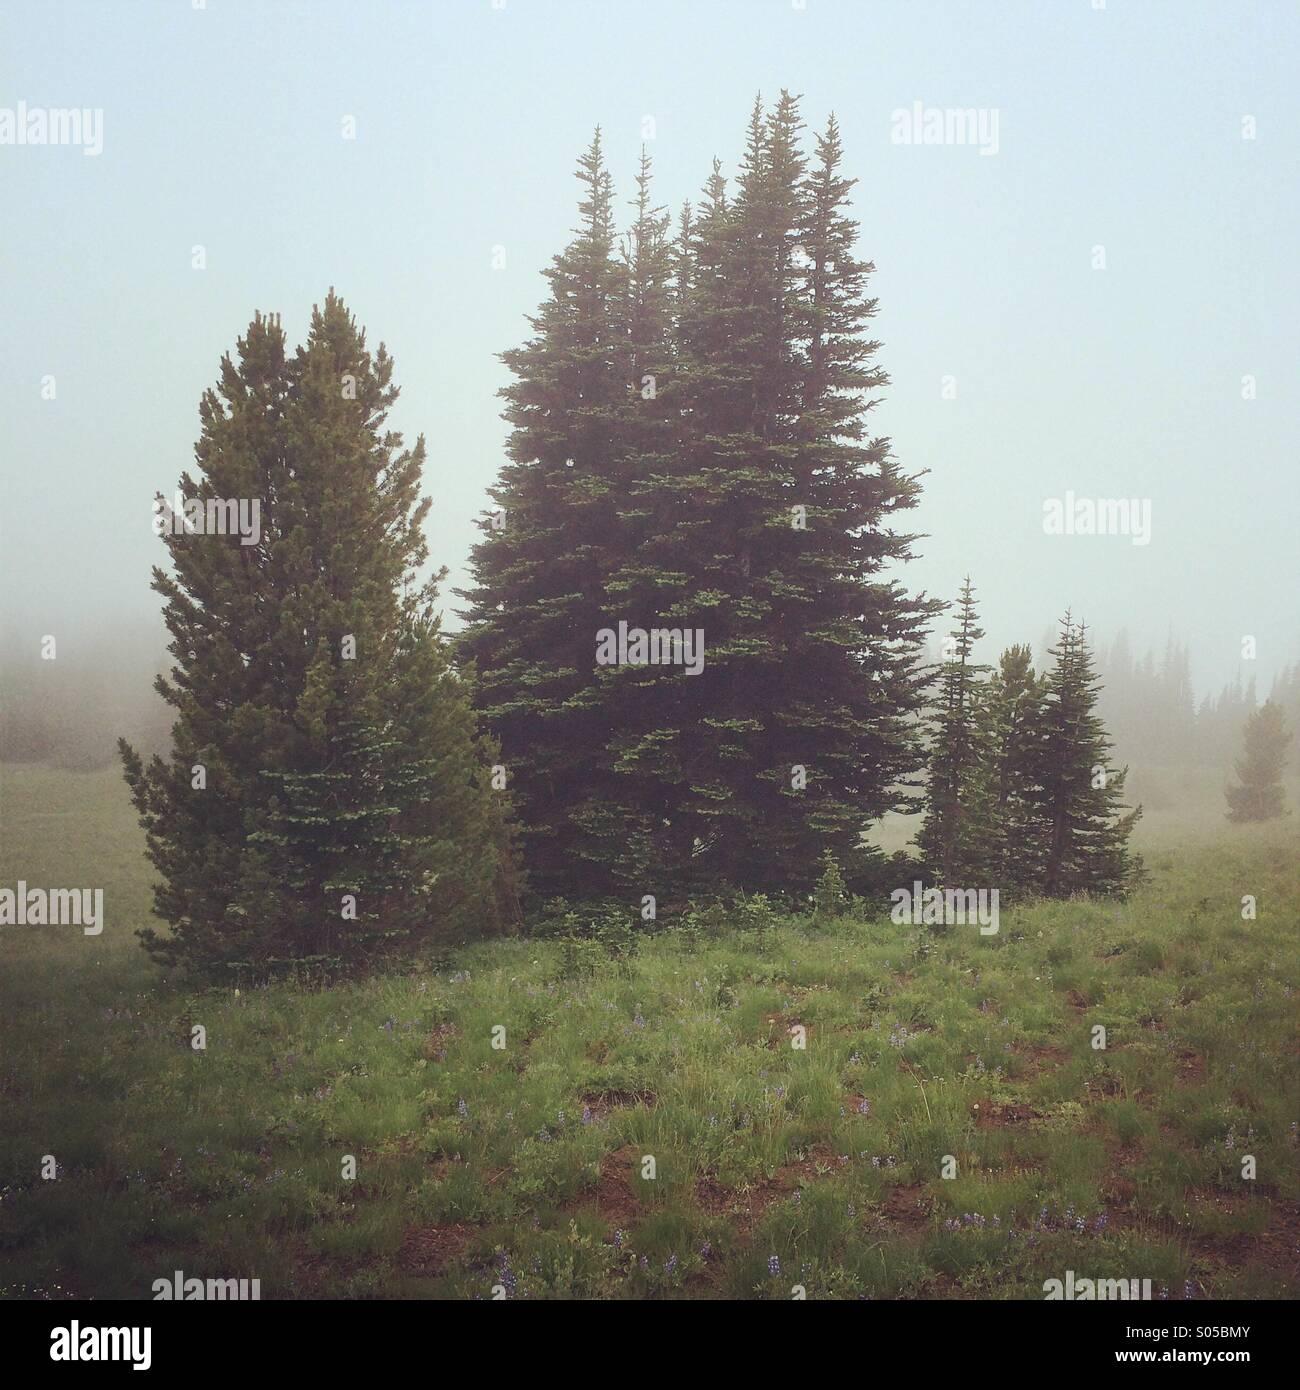 Alpine fir trees in fog, Mt. Rainier National Park, Washington - Stock Image